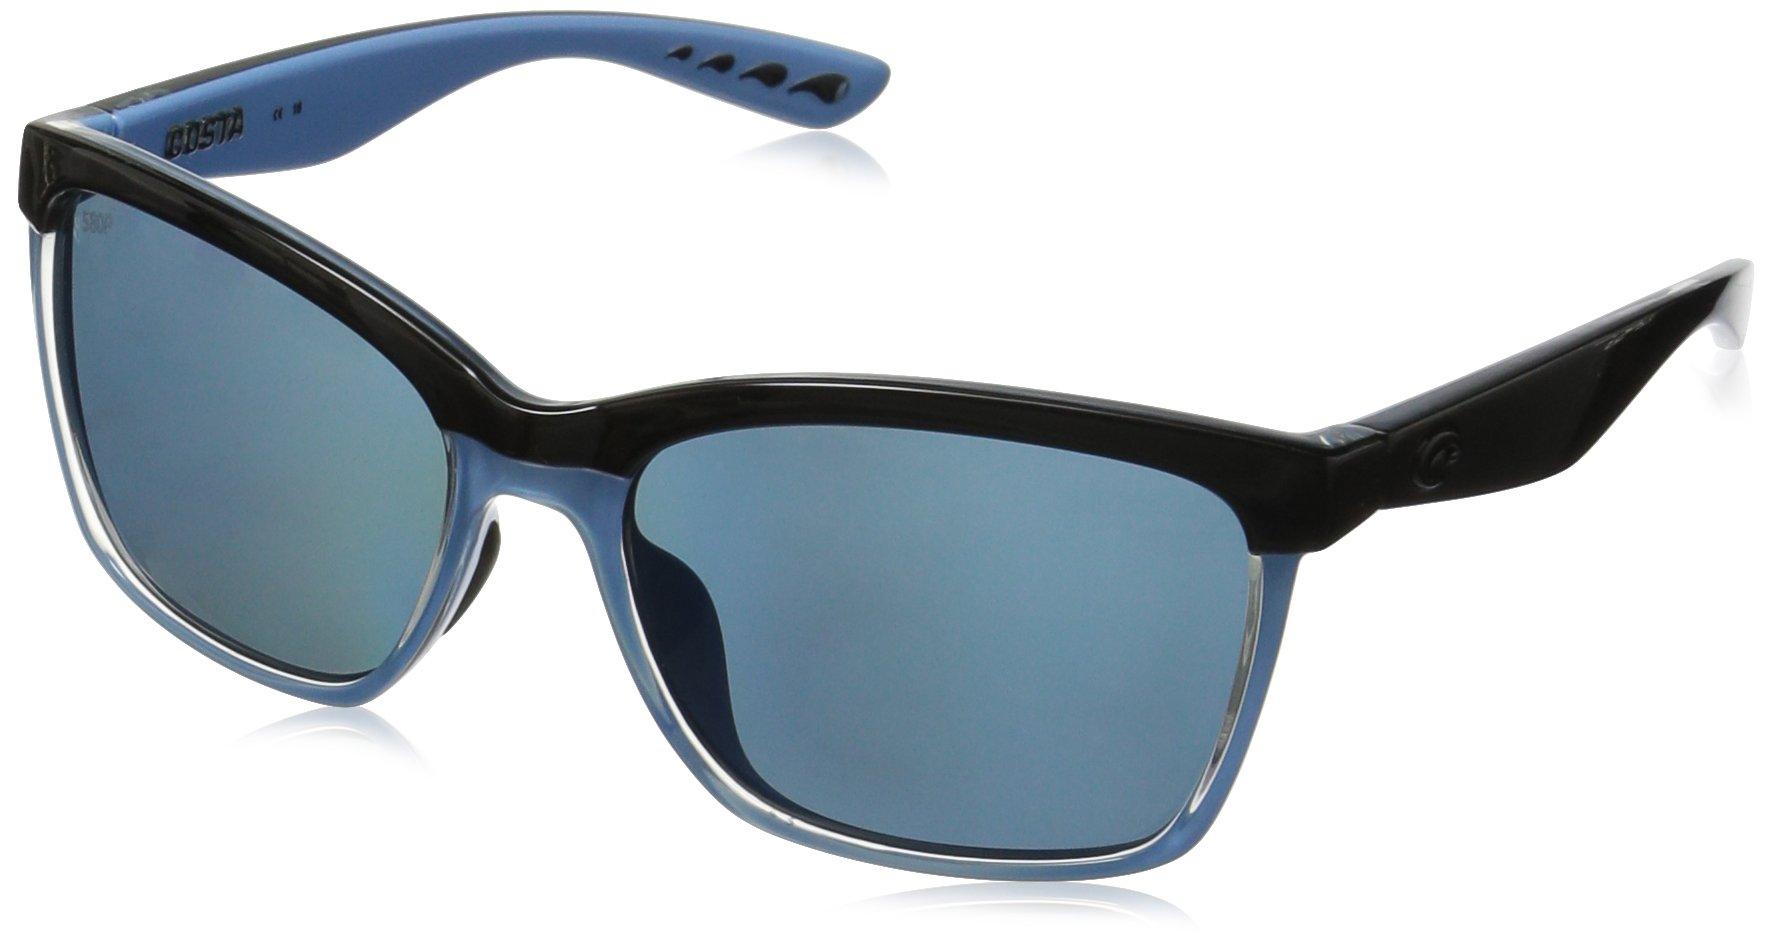 Costa Del Mar Anaa Sunglass, Shiny Black/Crystal/Light Blue, Gray 580Plastic